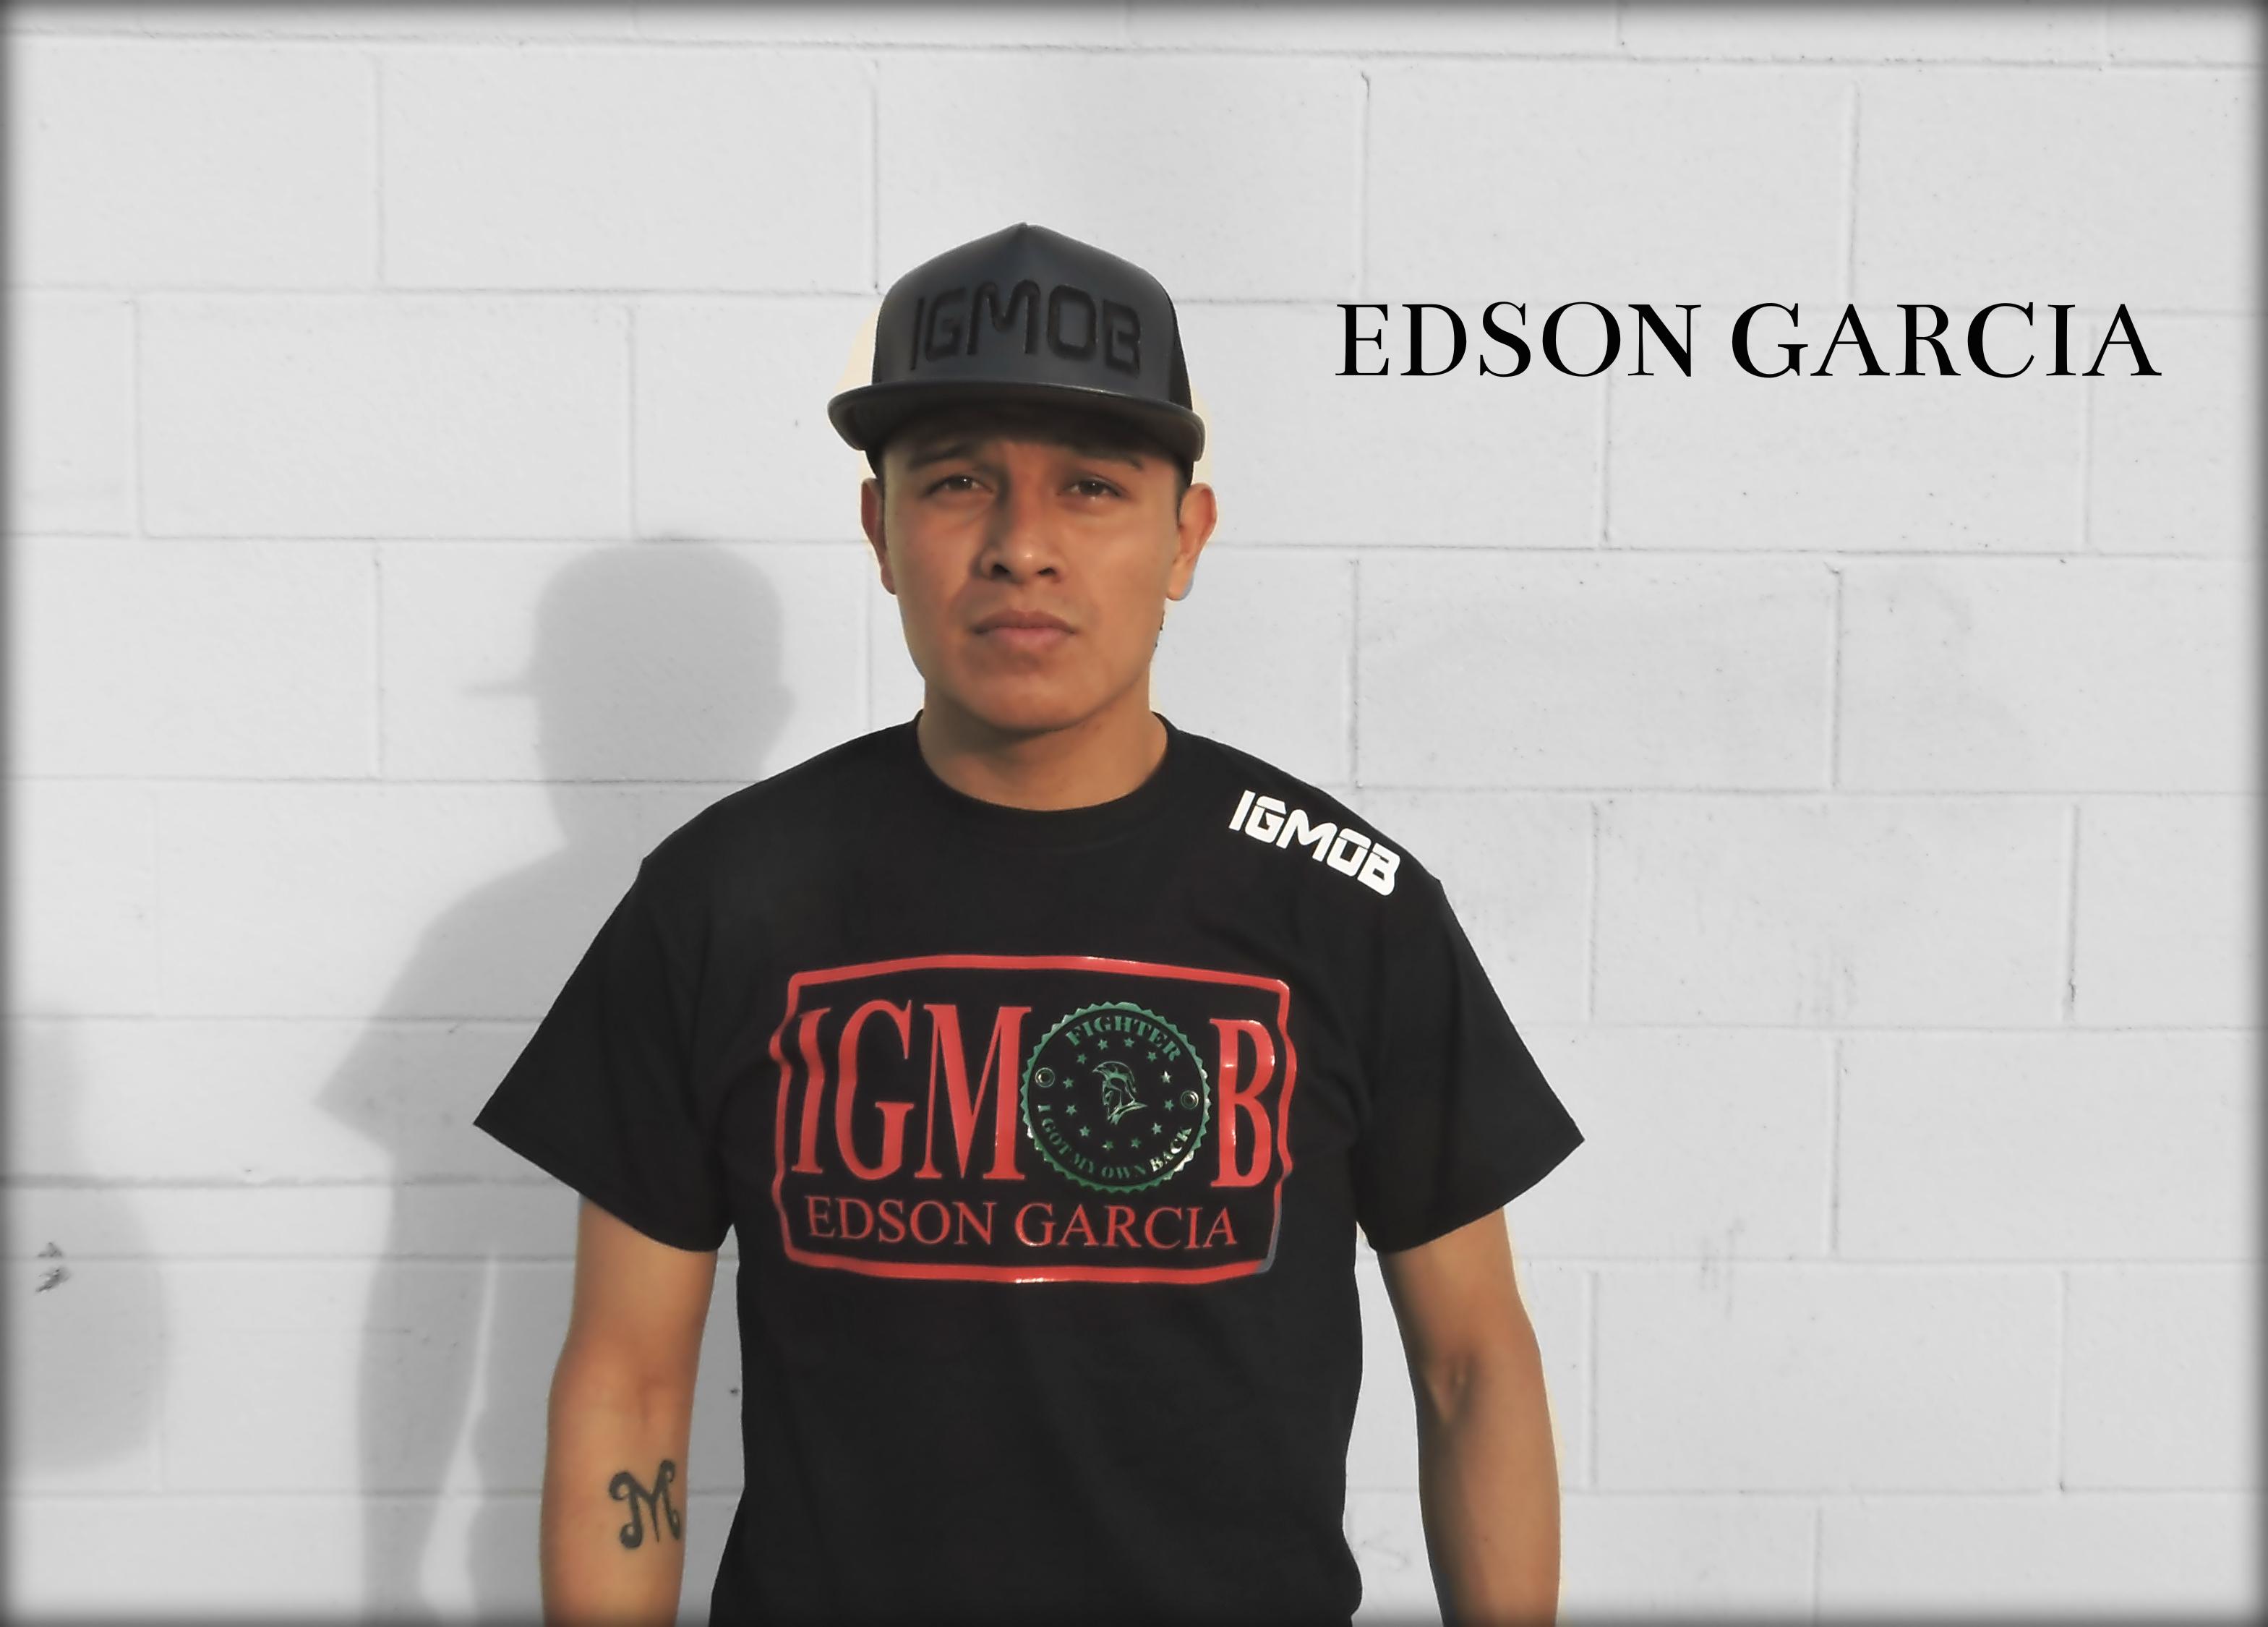 EDSON GARCIA